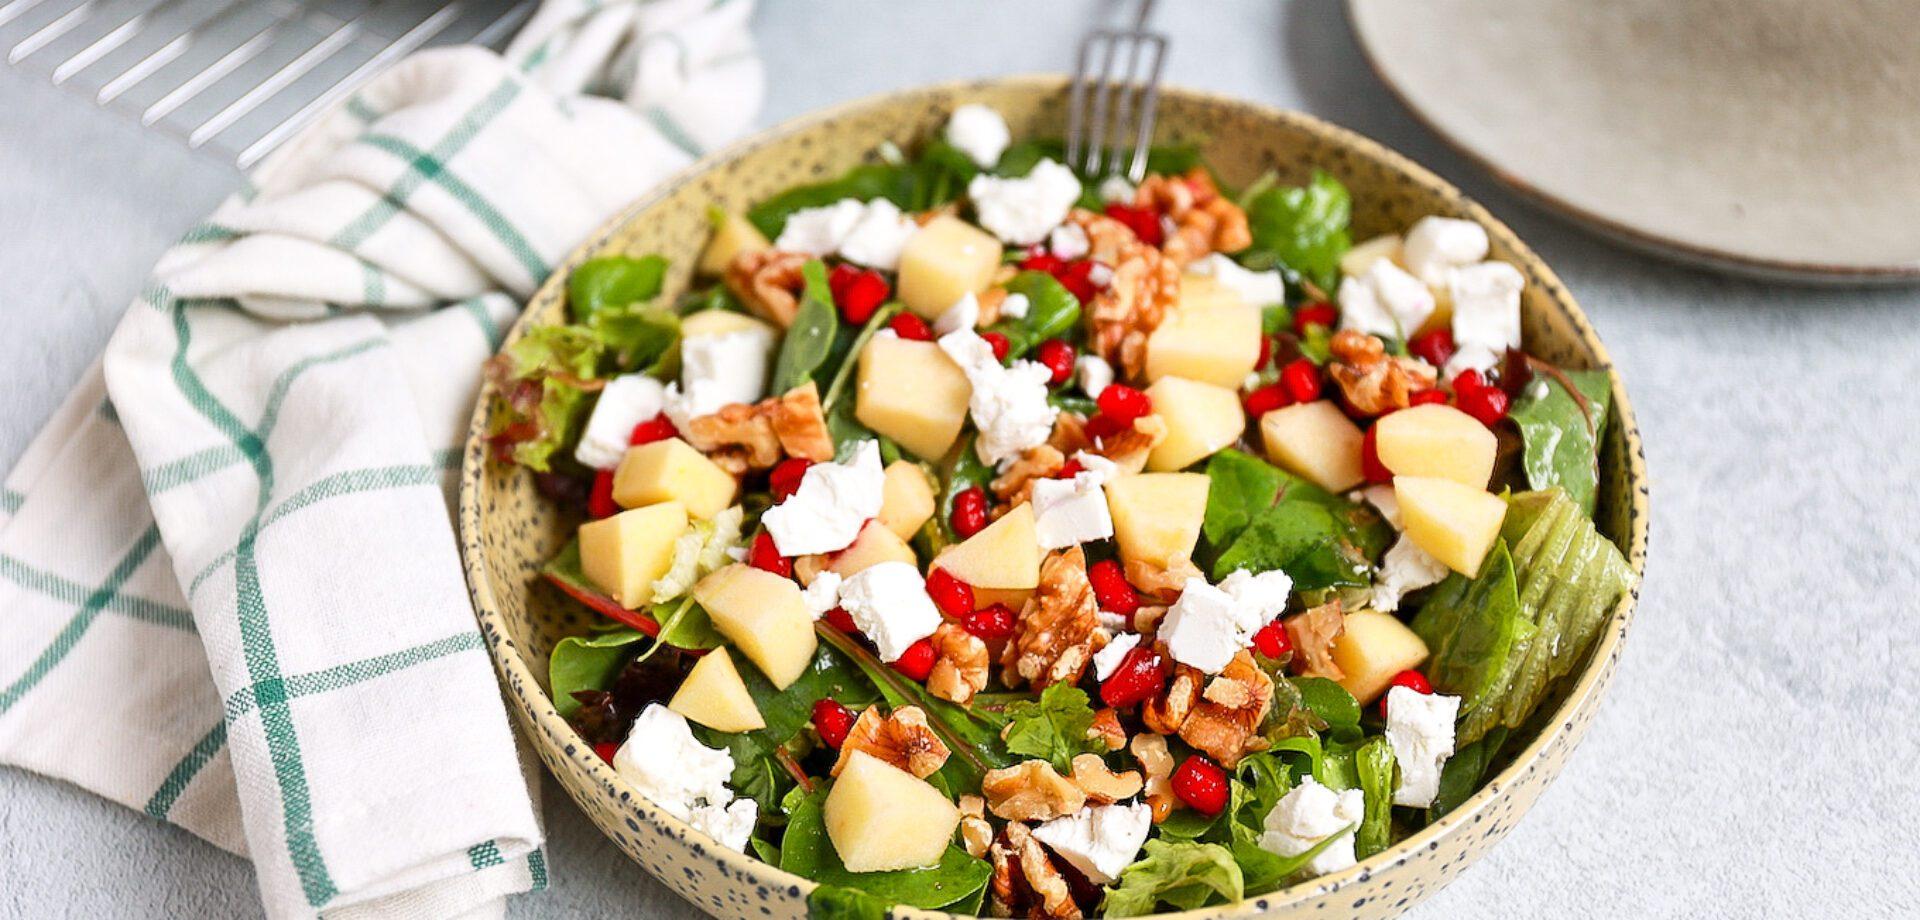 Salade met geitenkaas en granaatappel